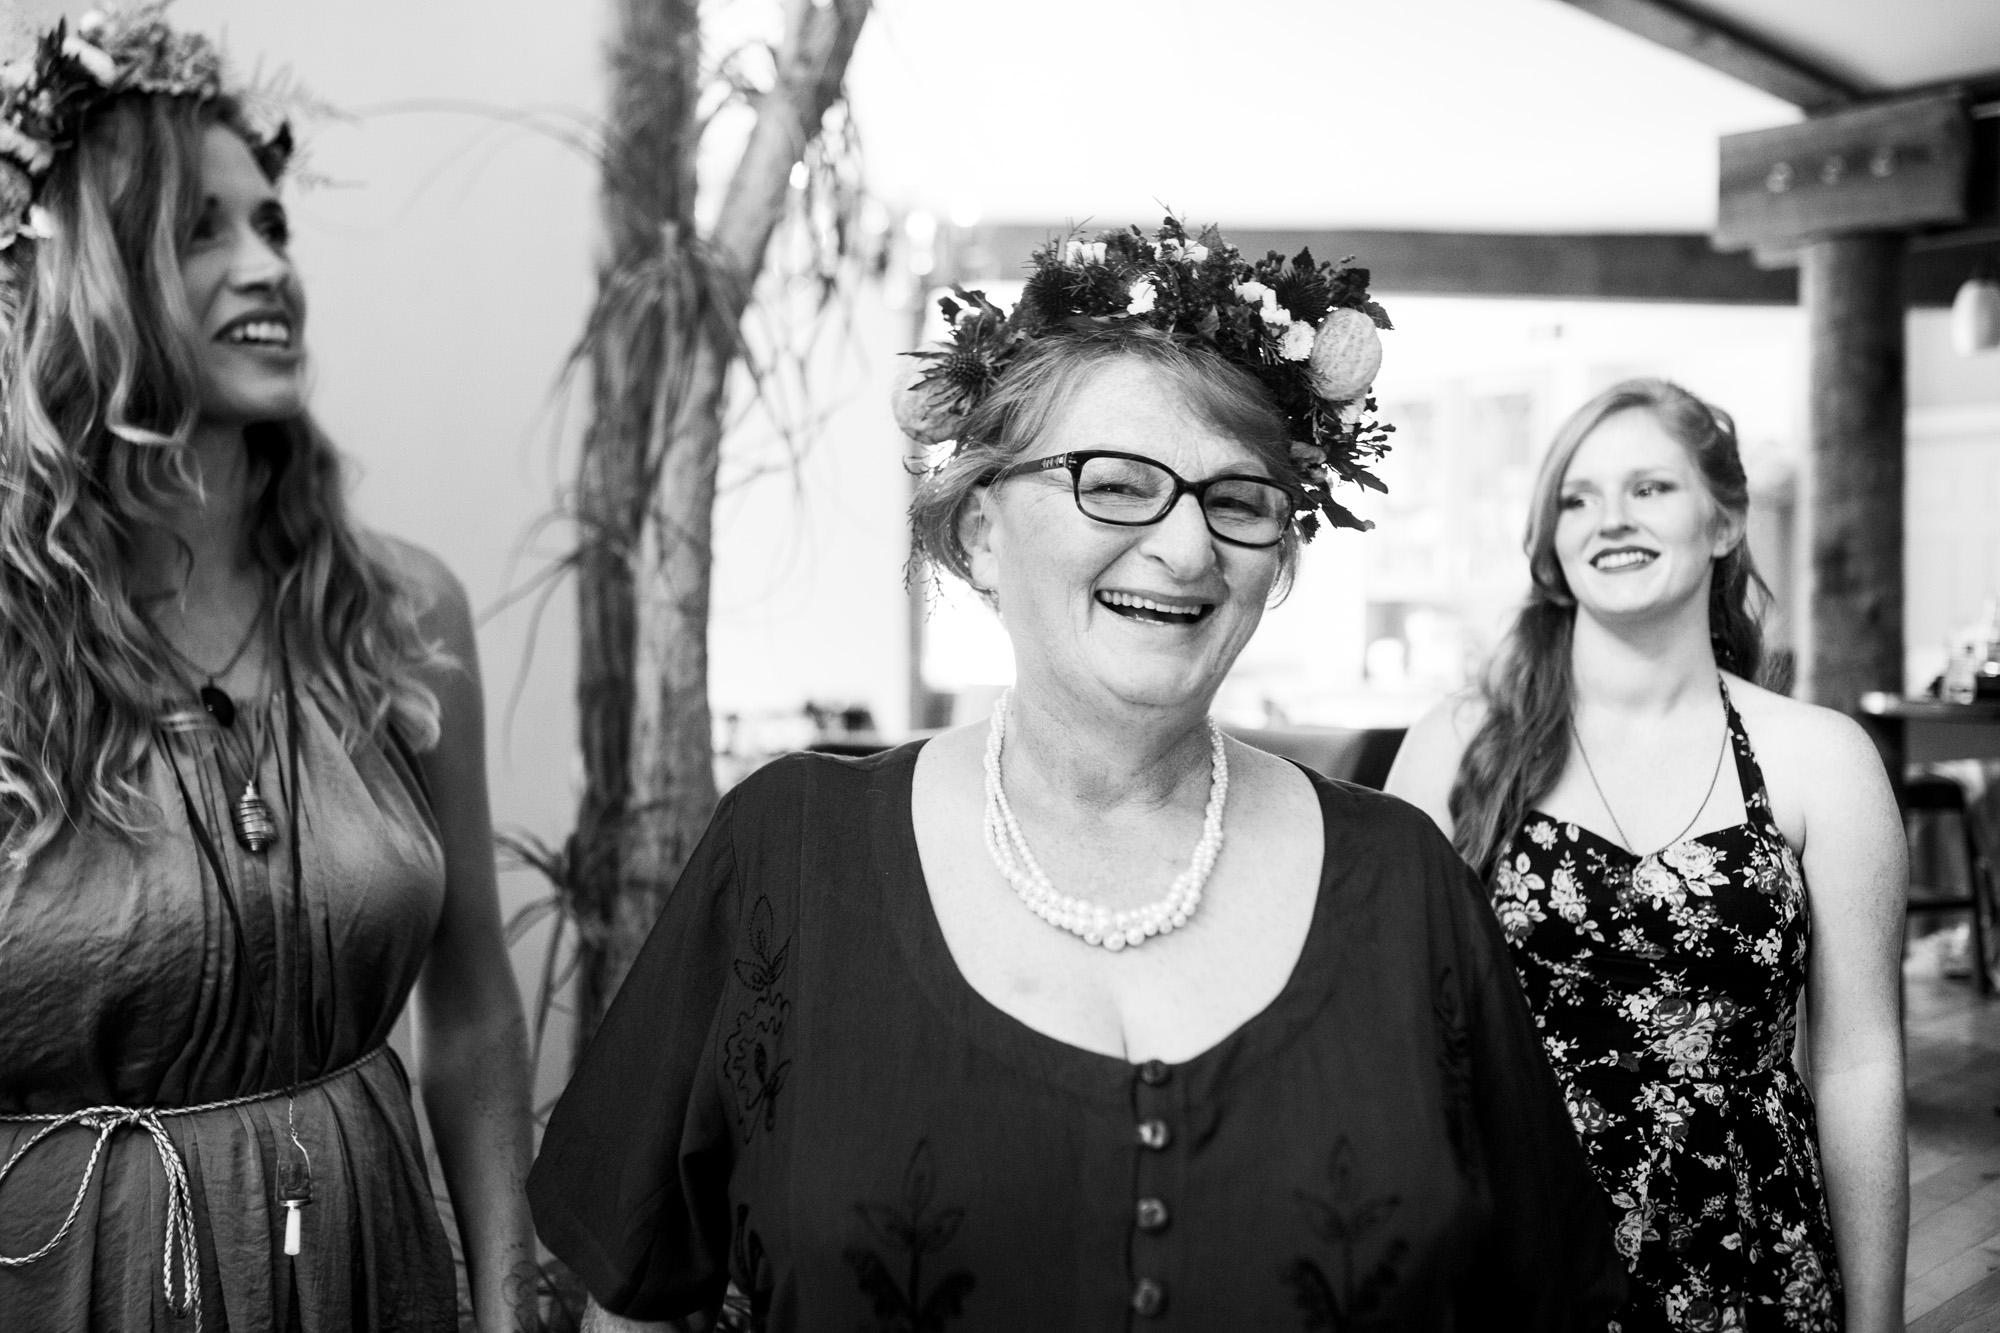 Seriously_Sabrina_Photography_Red_River_Gorge_Kentucky_Wedding_ShawnDana84.jpg